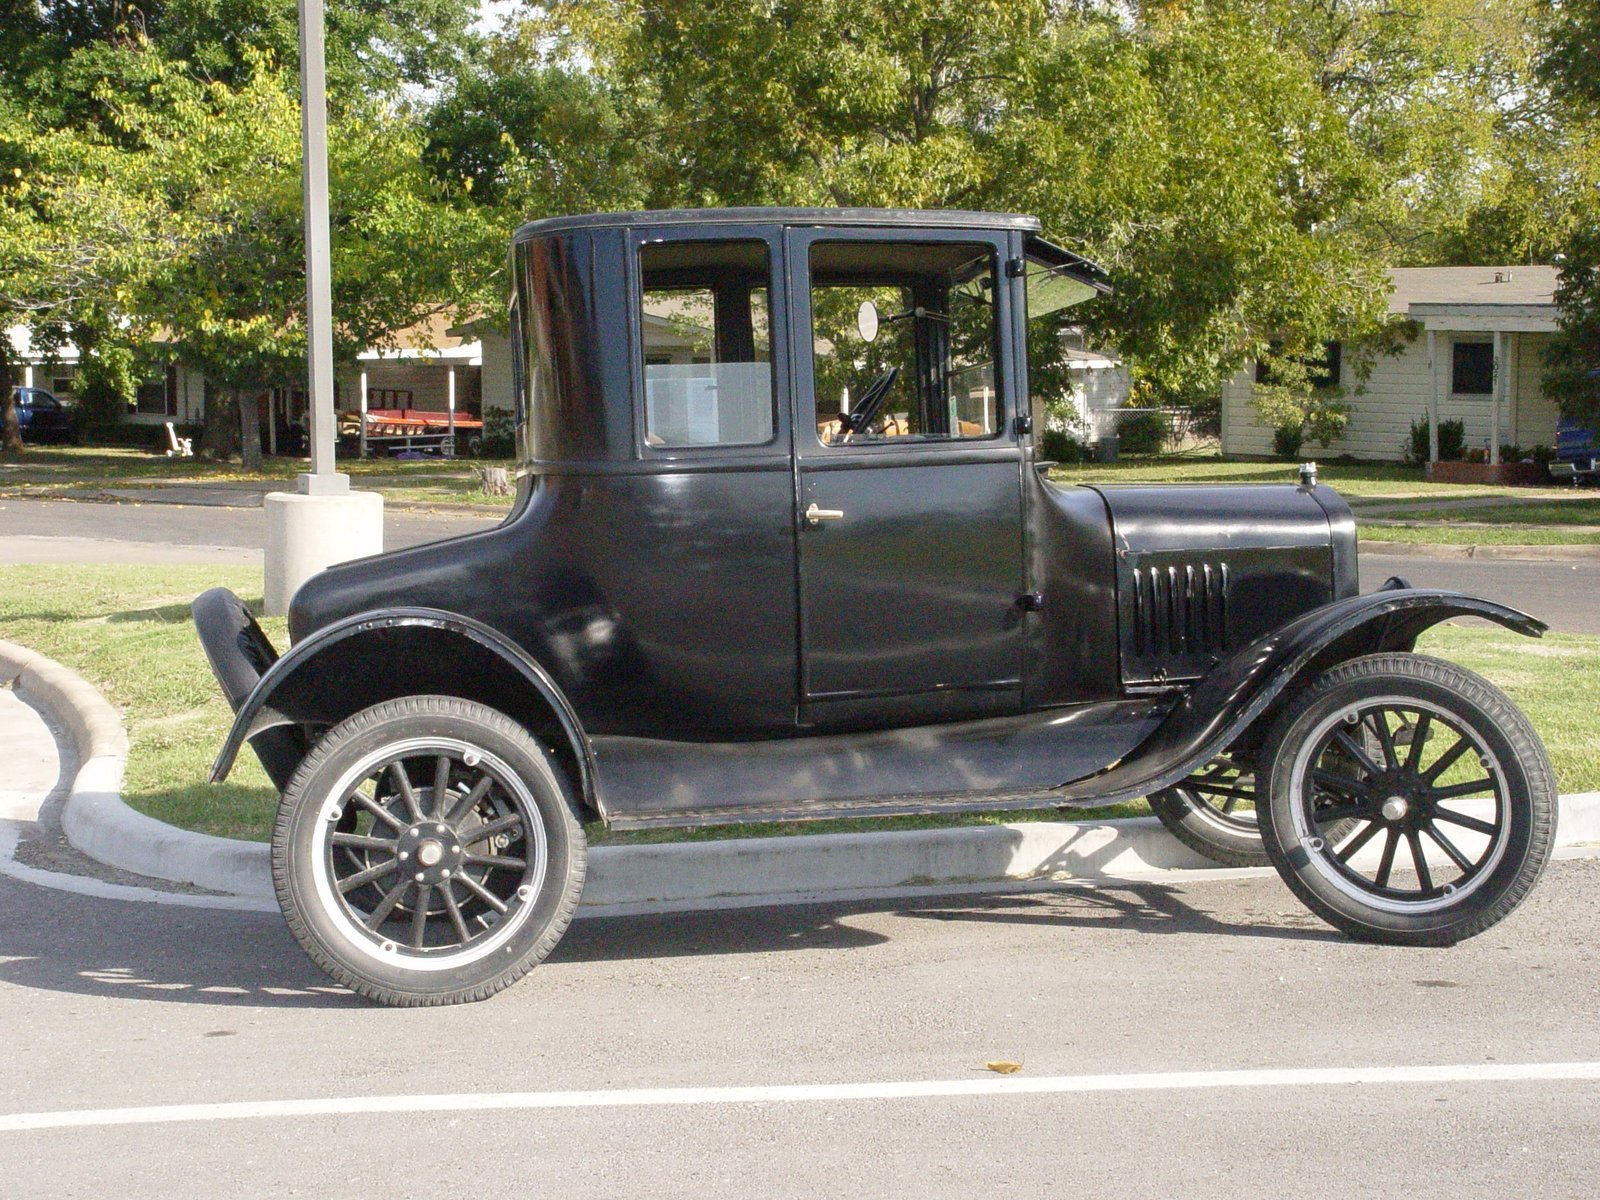 free old car stock photo. Black Bedroom Furniture Sets. Home Design Ideas